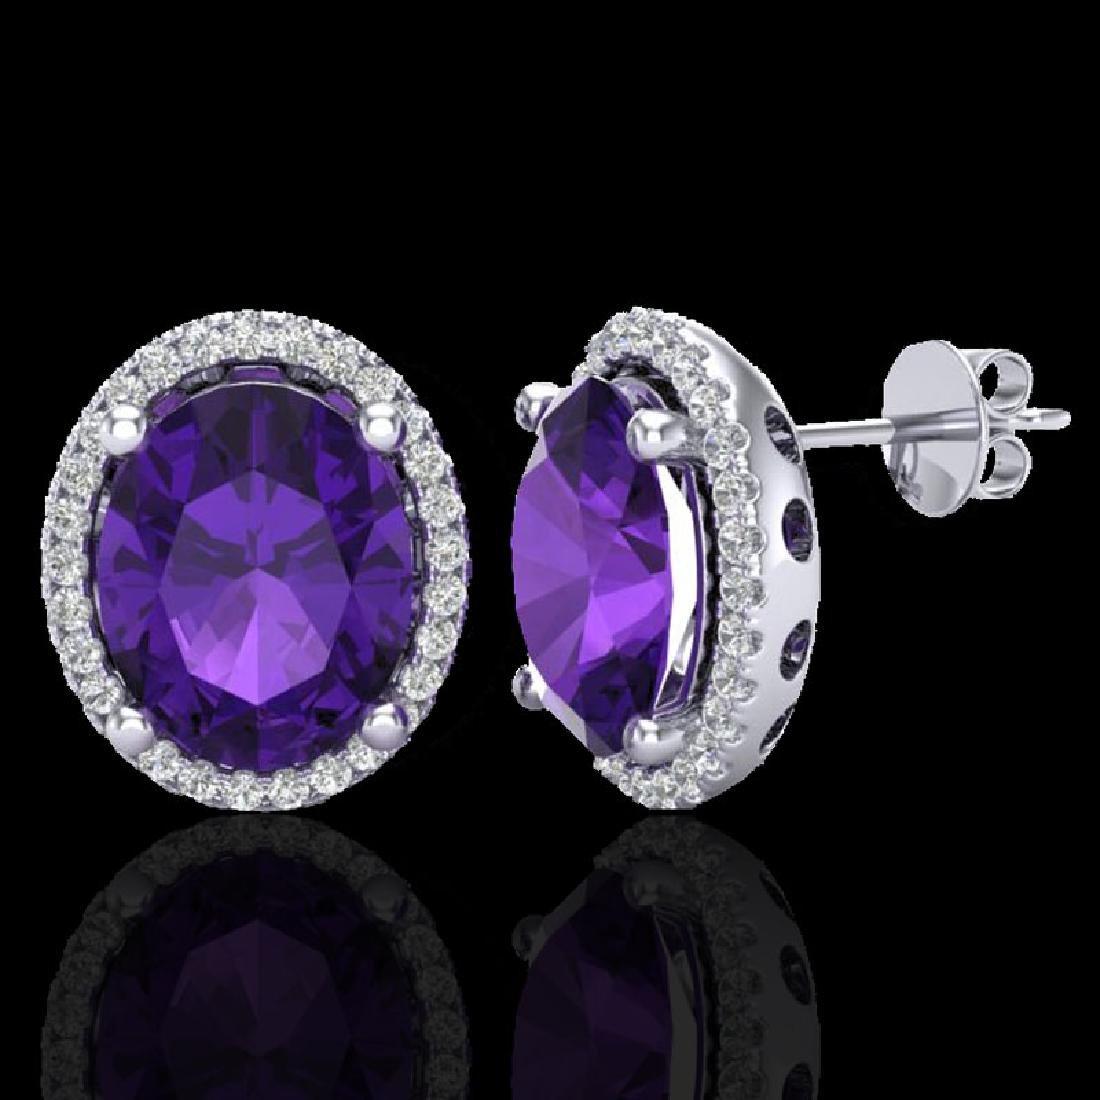 5 CTW Amethyst & Micro Pave VS/SI Diamond Earrings Halo - 2